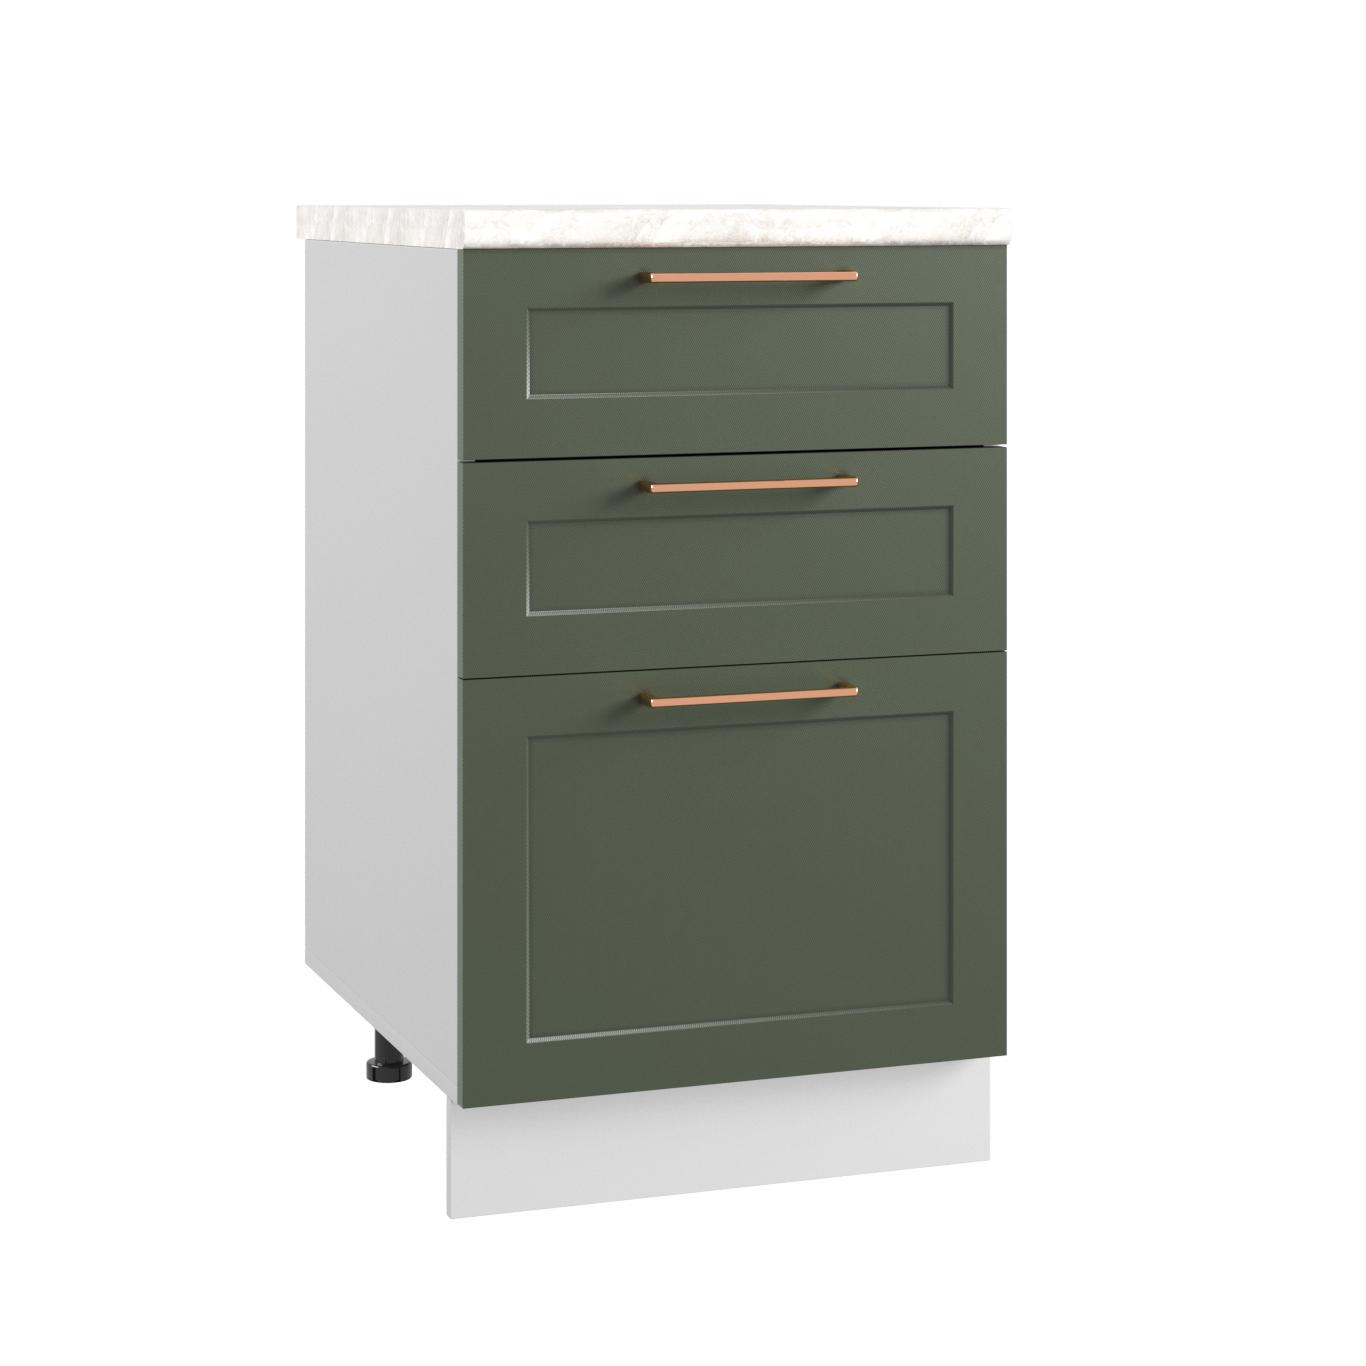 Кухня Квадро СЯ 500 Шкаф нижний с ящиками